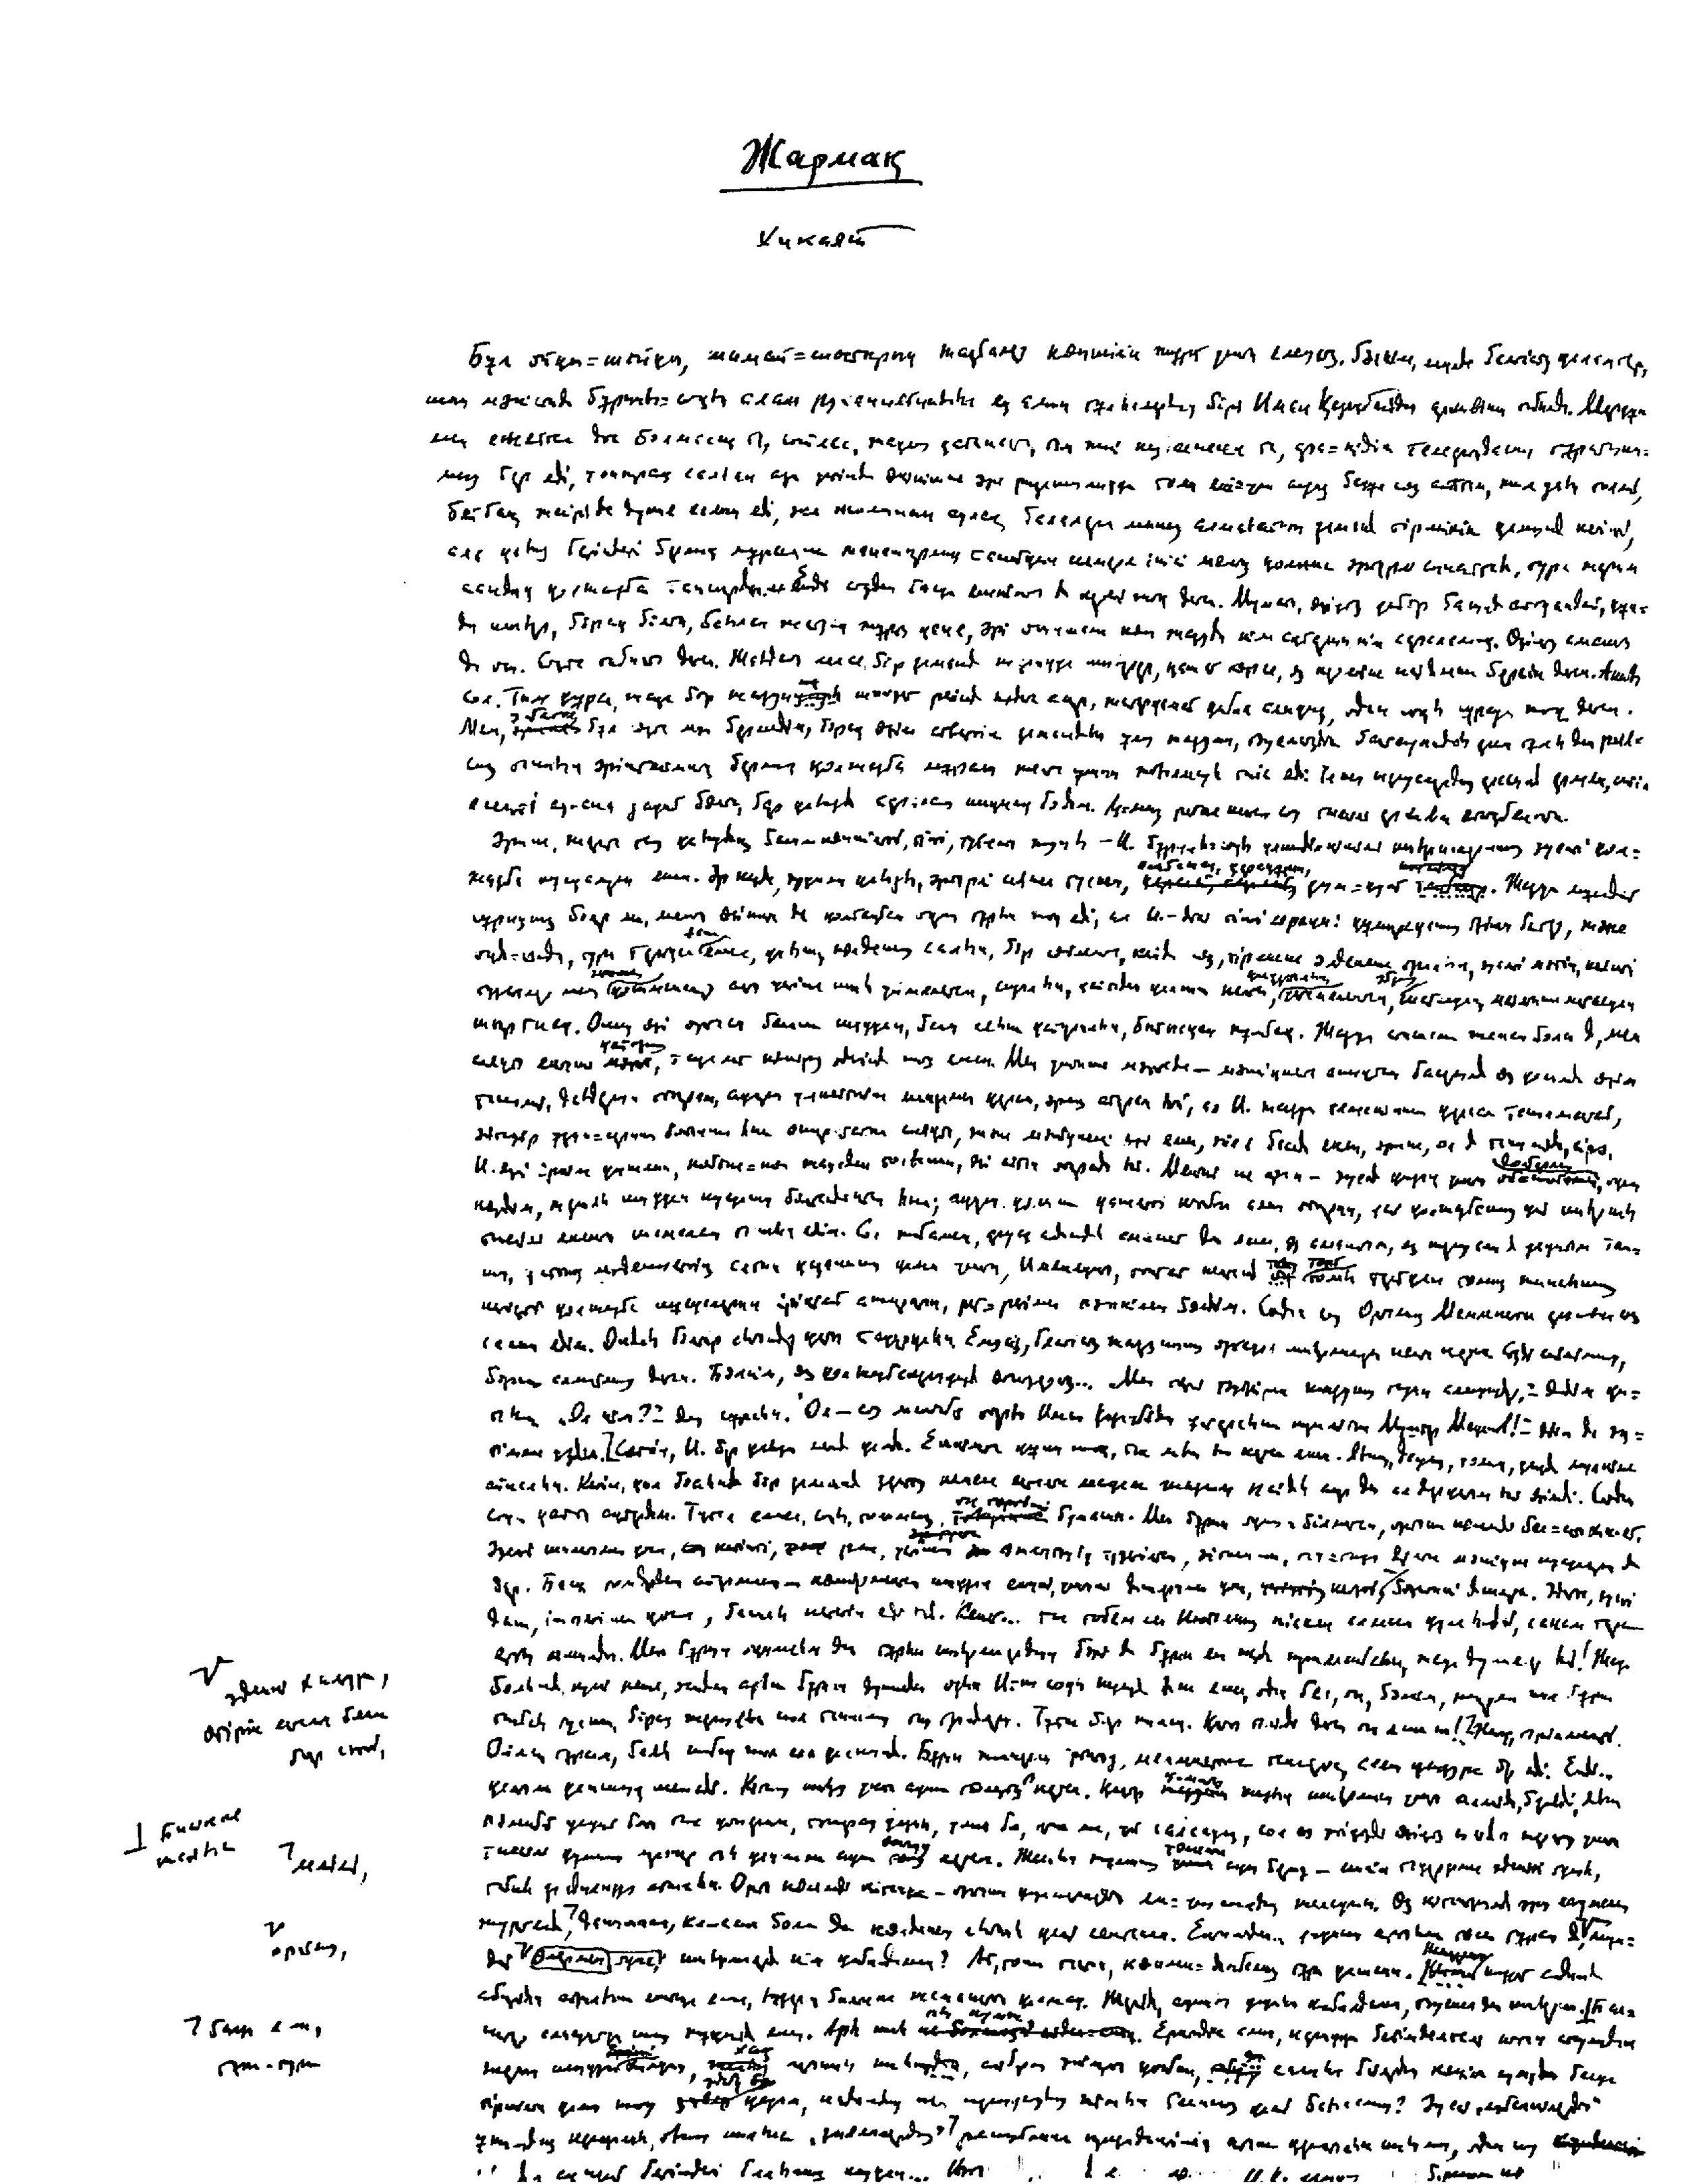 Manuscript Second Draft.jpeg